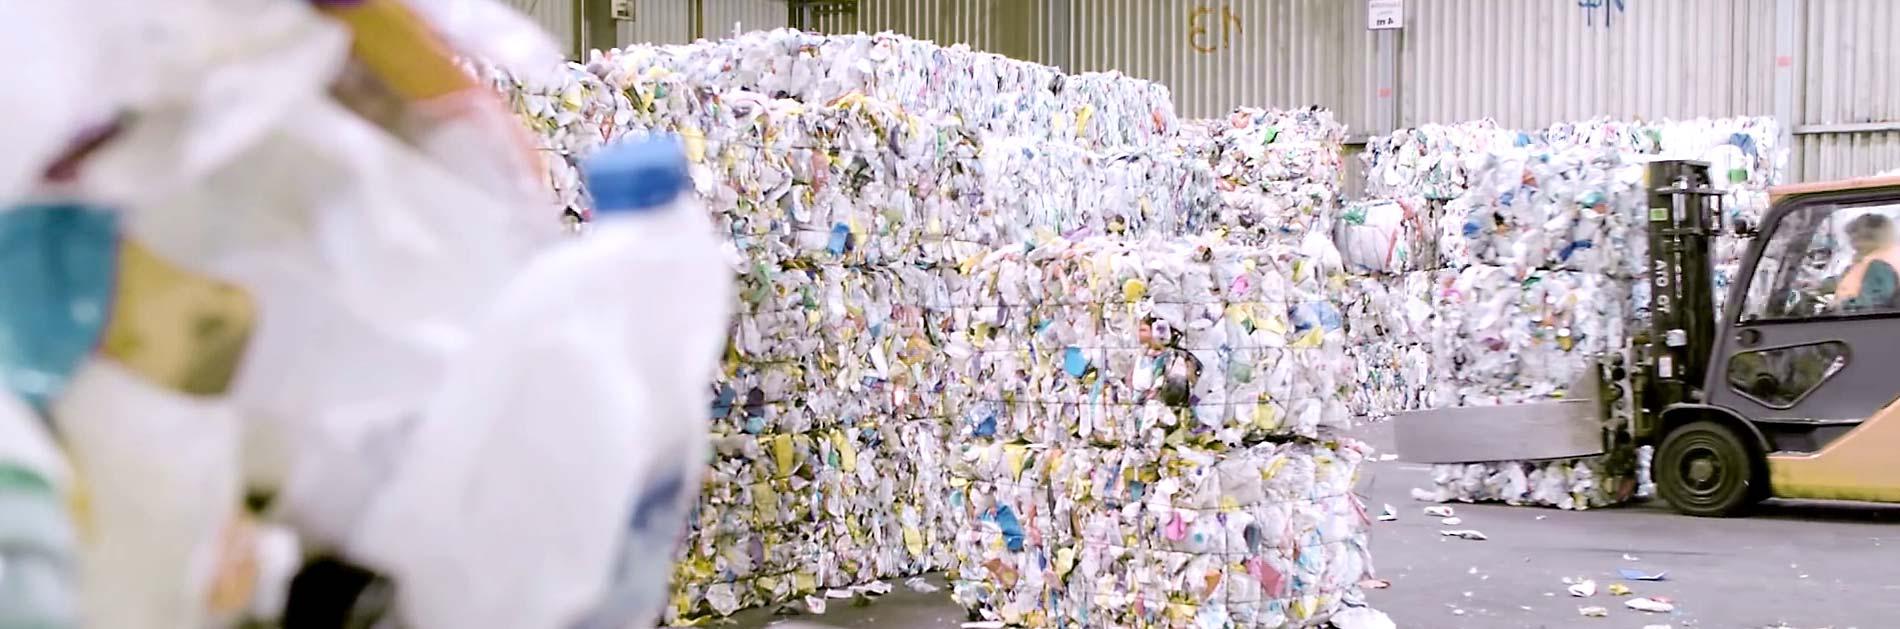 Kunststoffabfall Lager